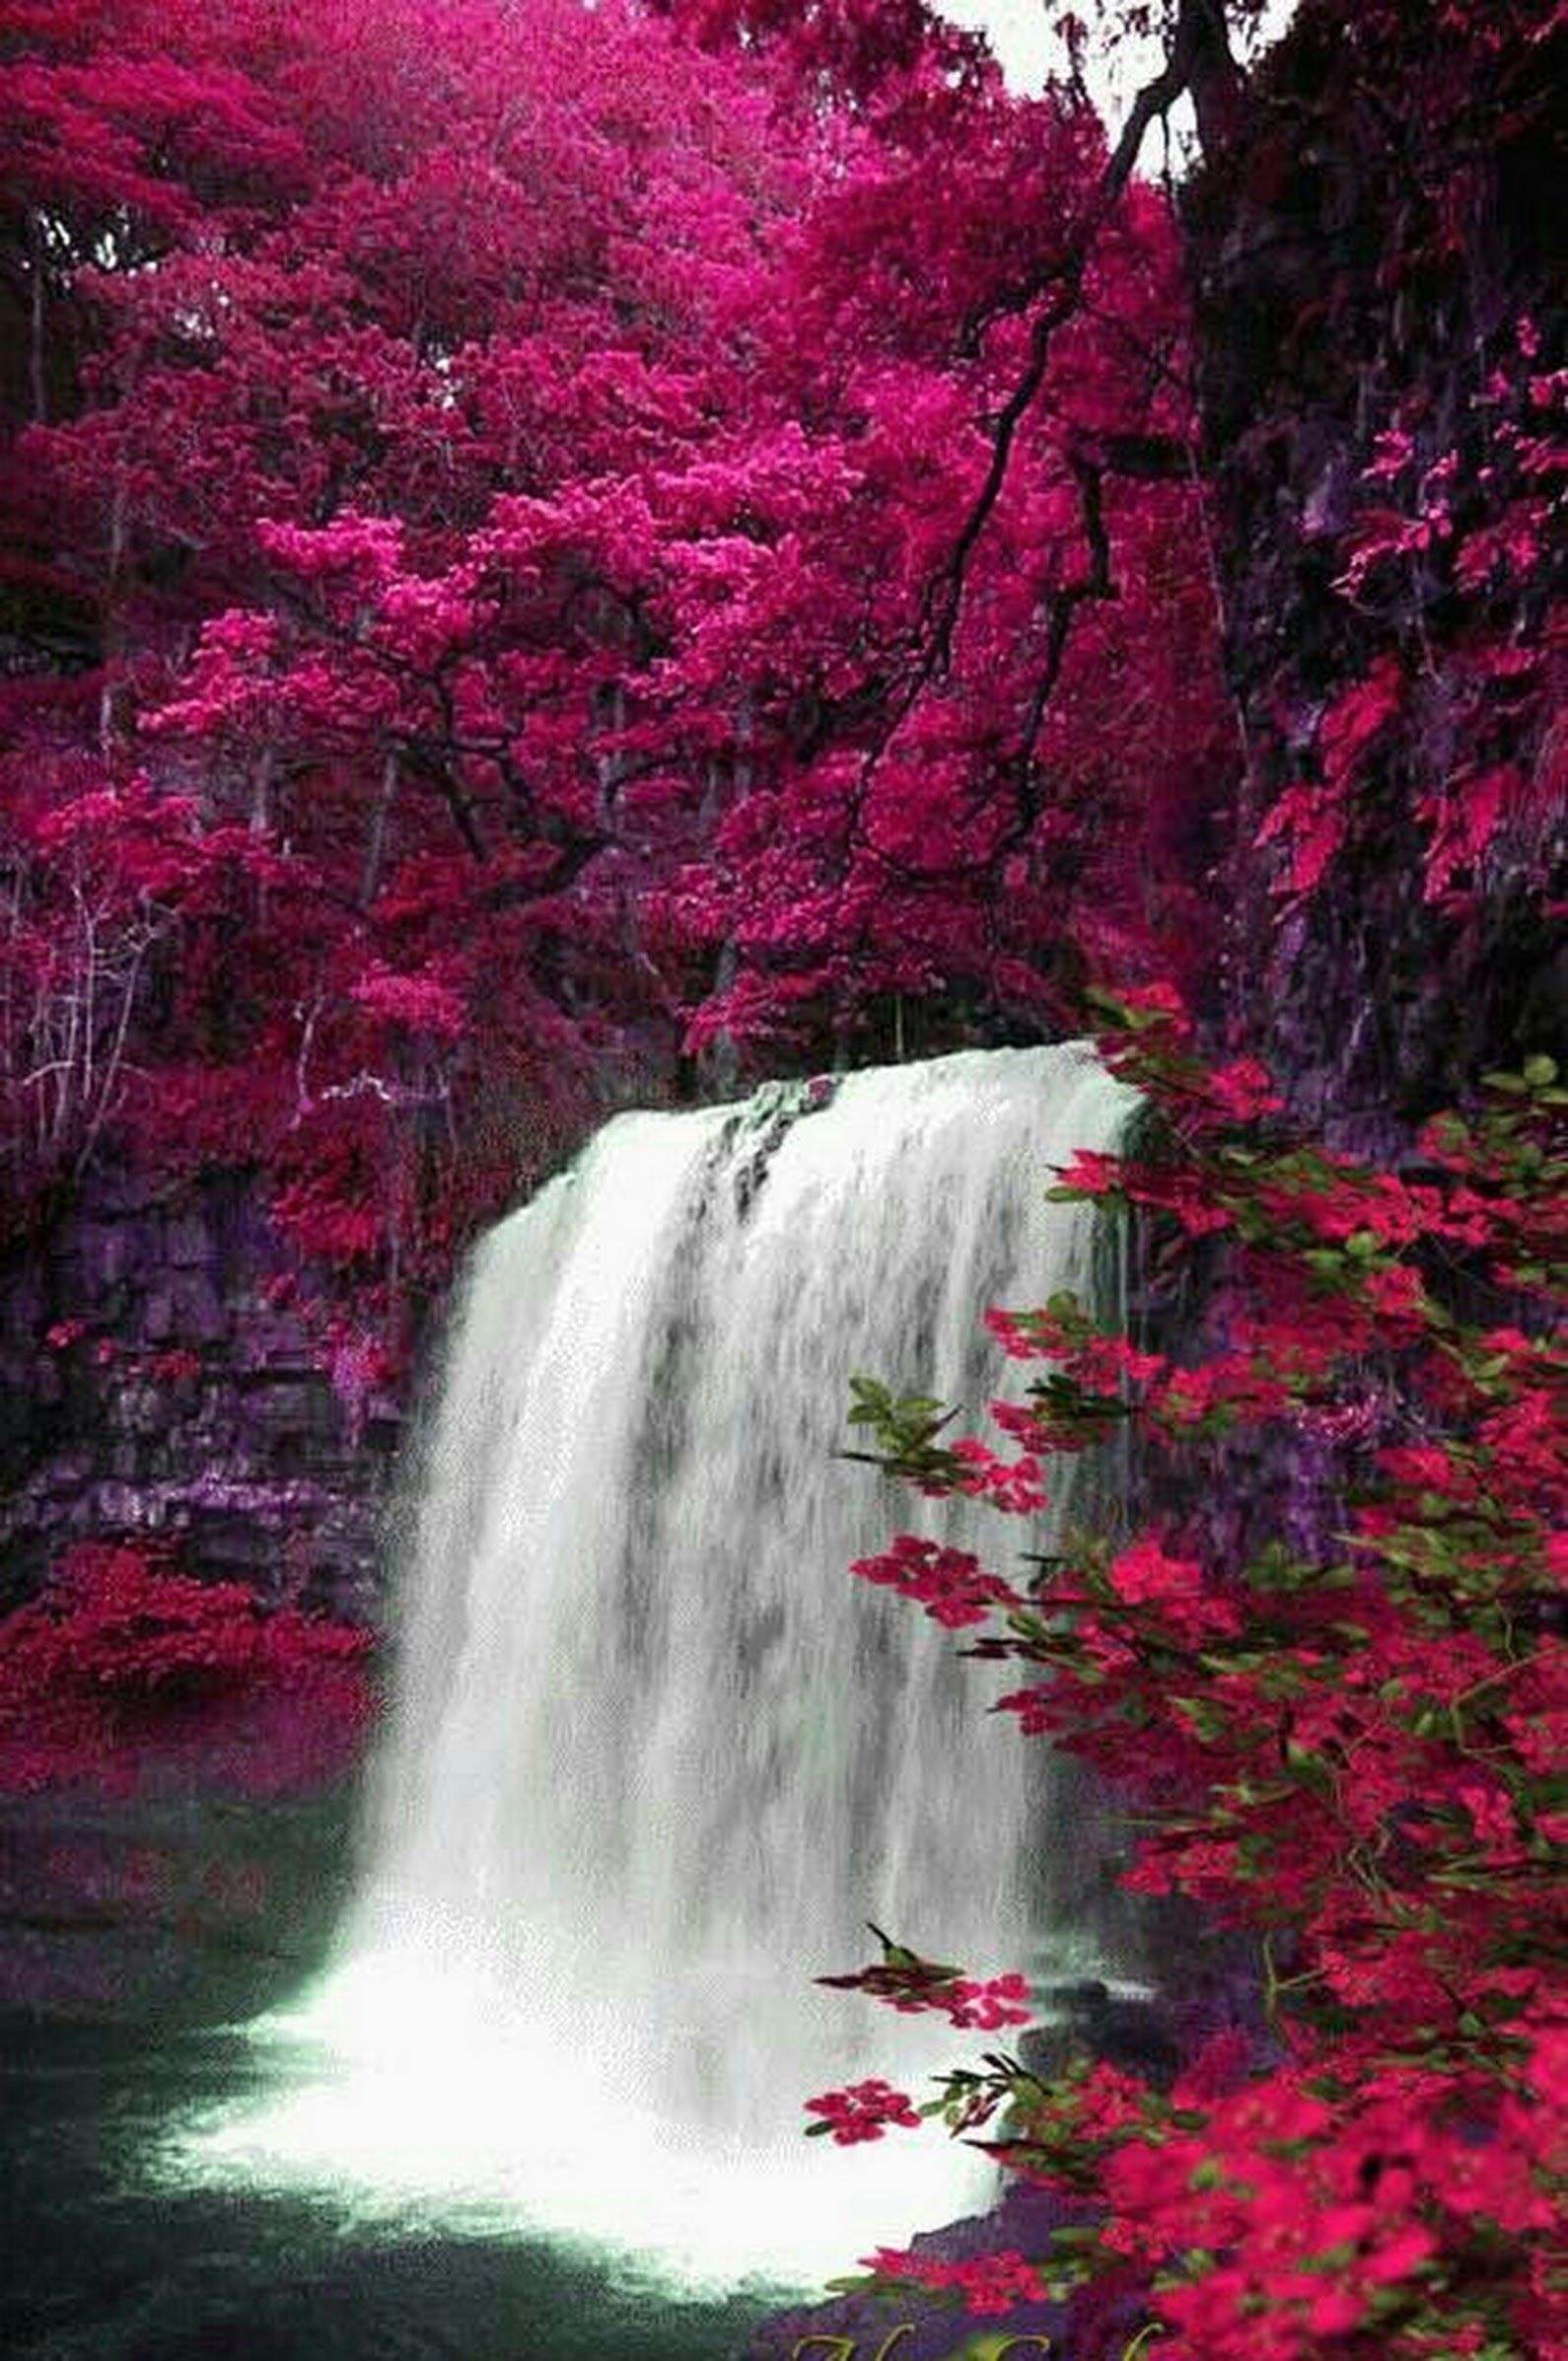 Autumn Waterfall Beautiful Waterfalls Nature Pictures Beautiful Landscapes